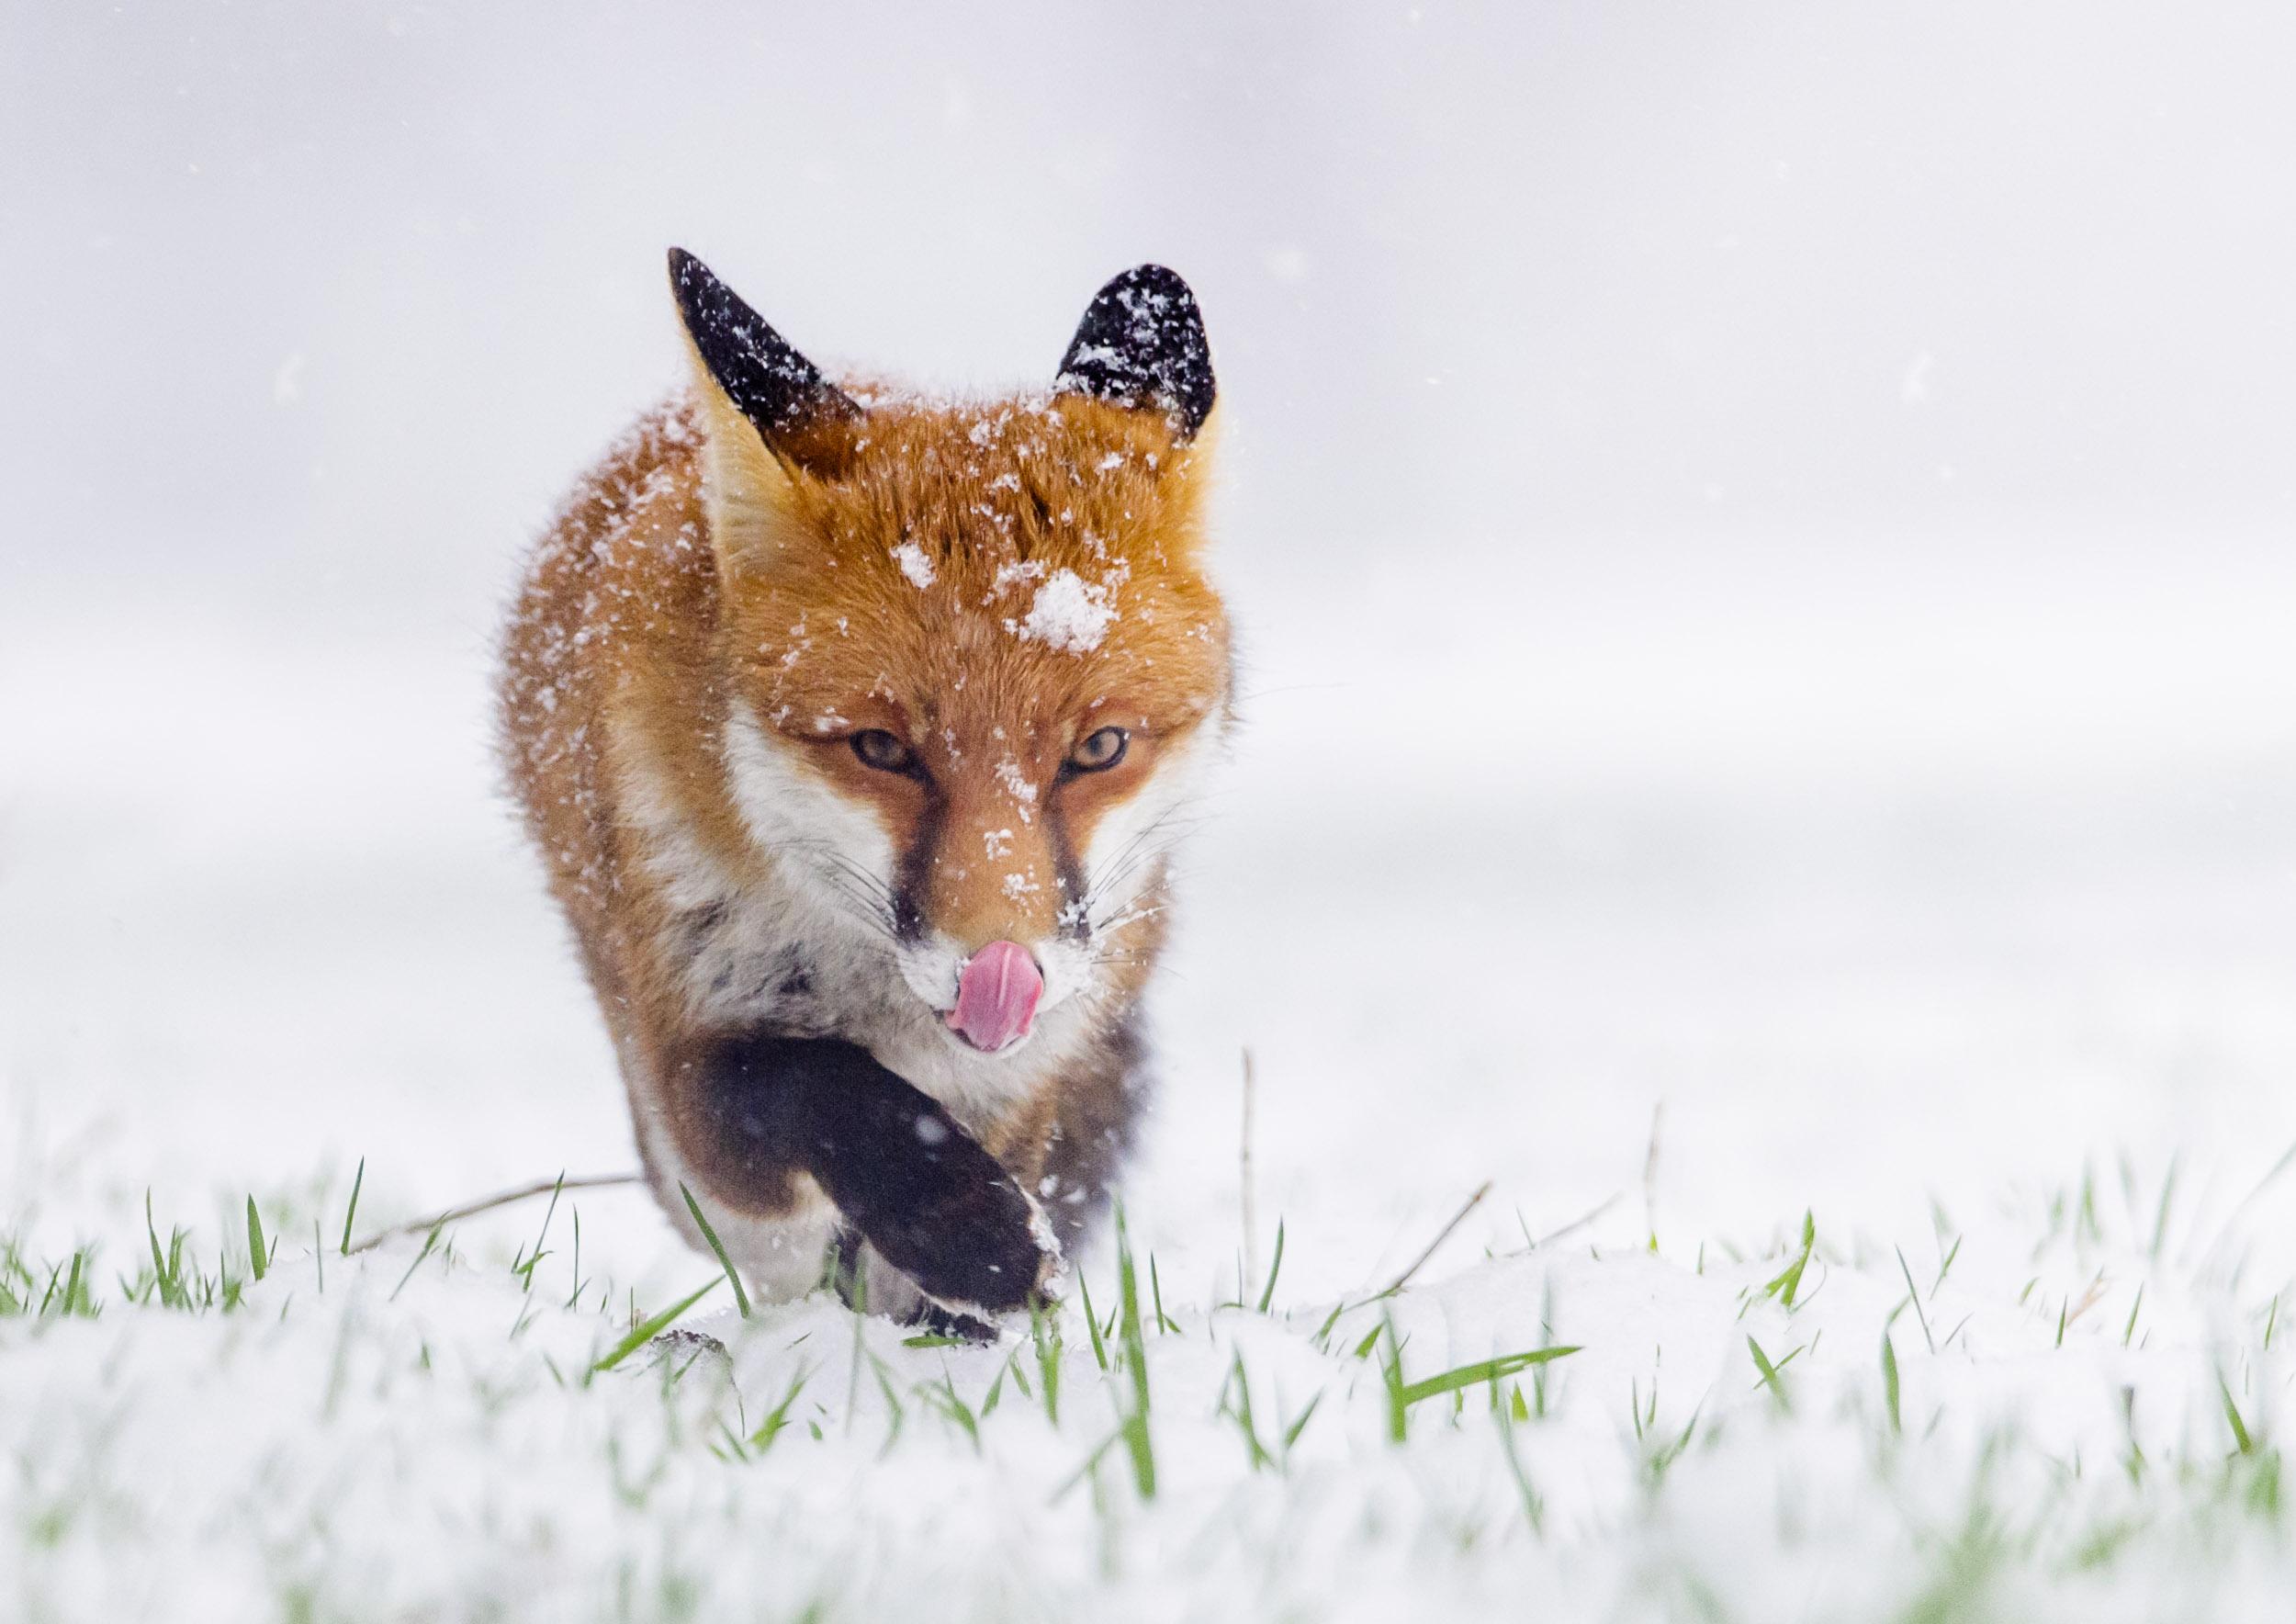 Red Fox (Vulpes vulpes), walking through falling snow, London, 01/13. Cropped